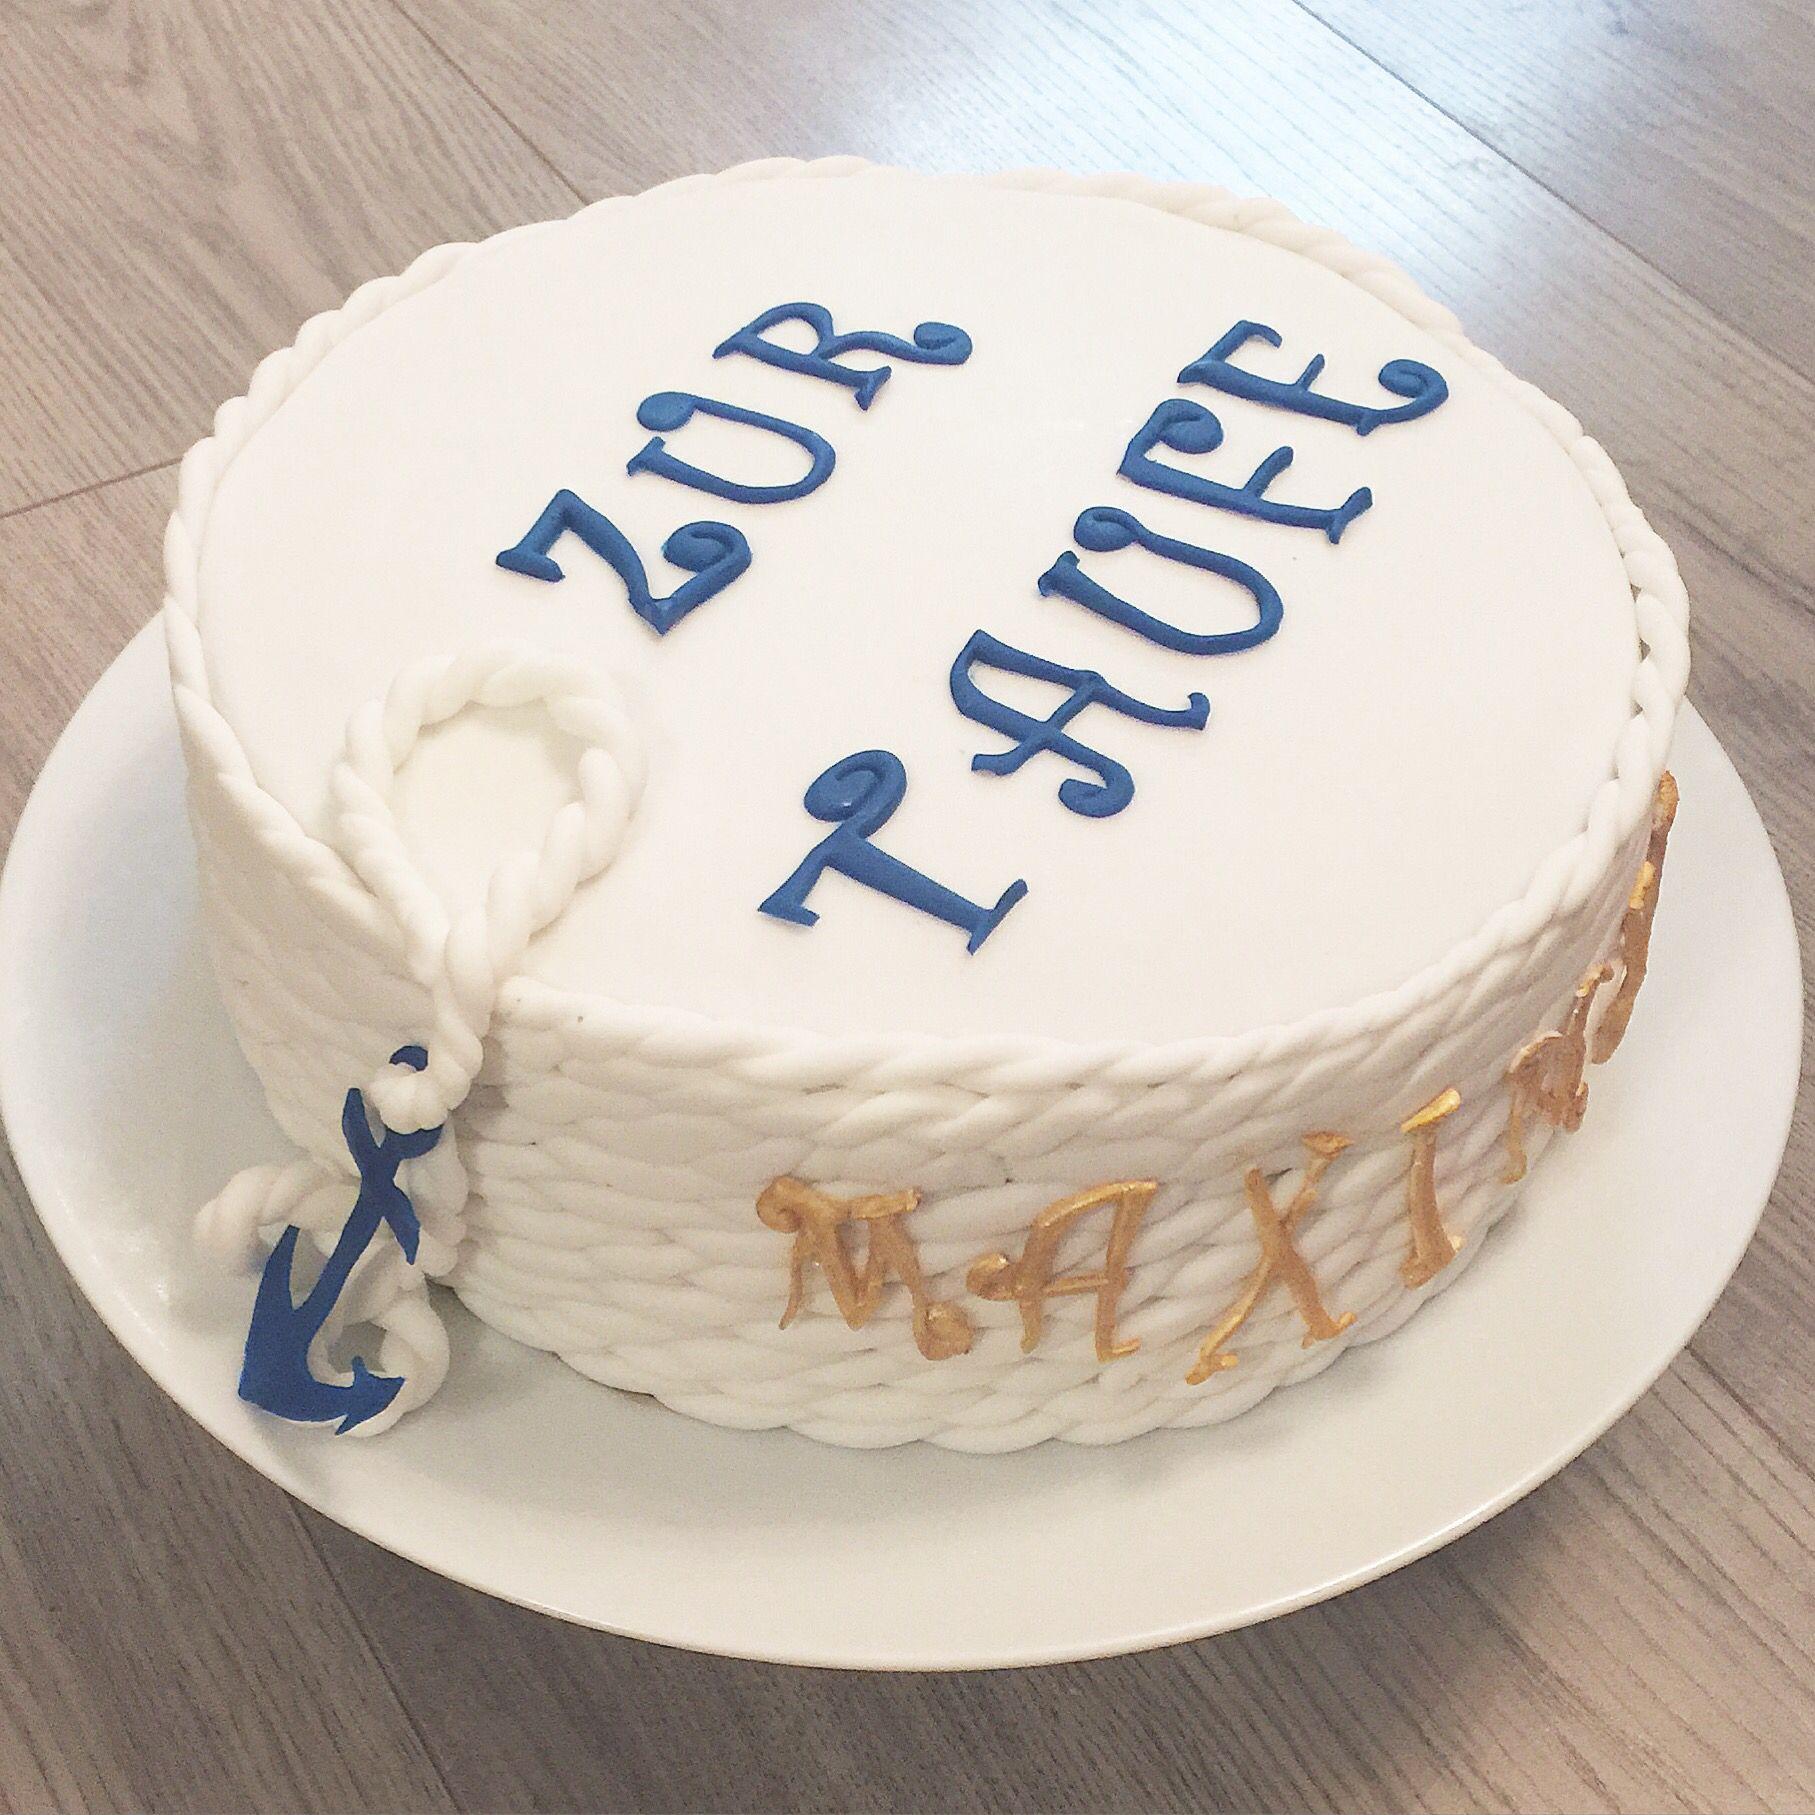 Torte maritim Taufe Tauftorte Christening Anker Fondant